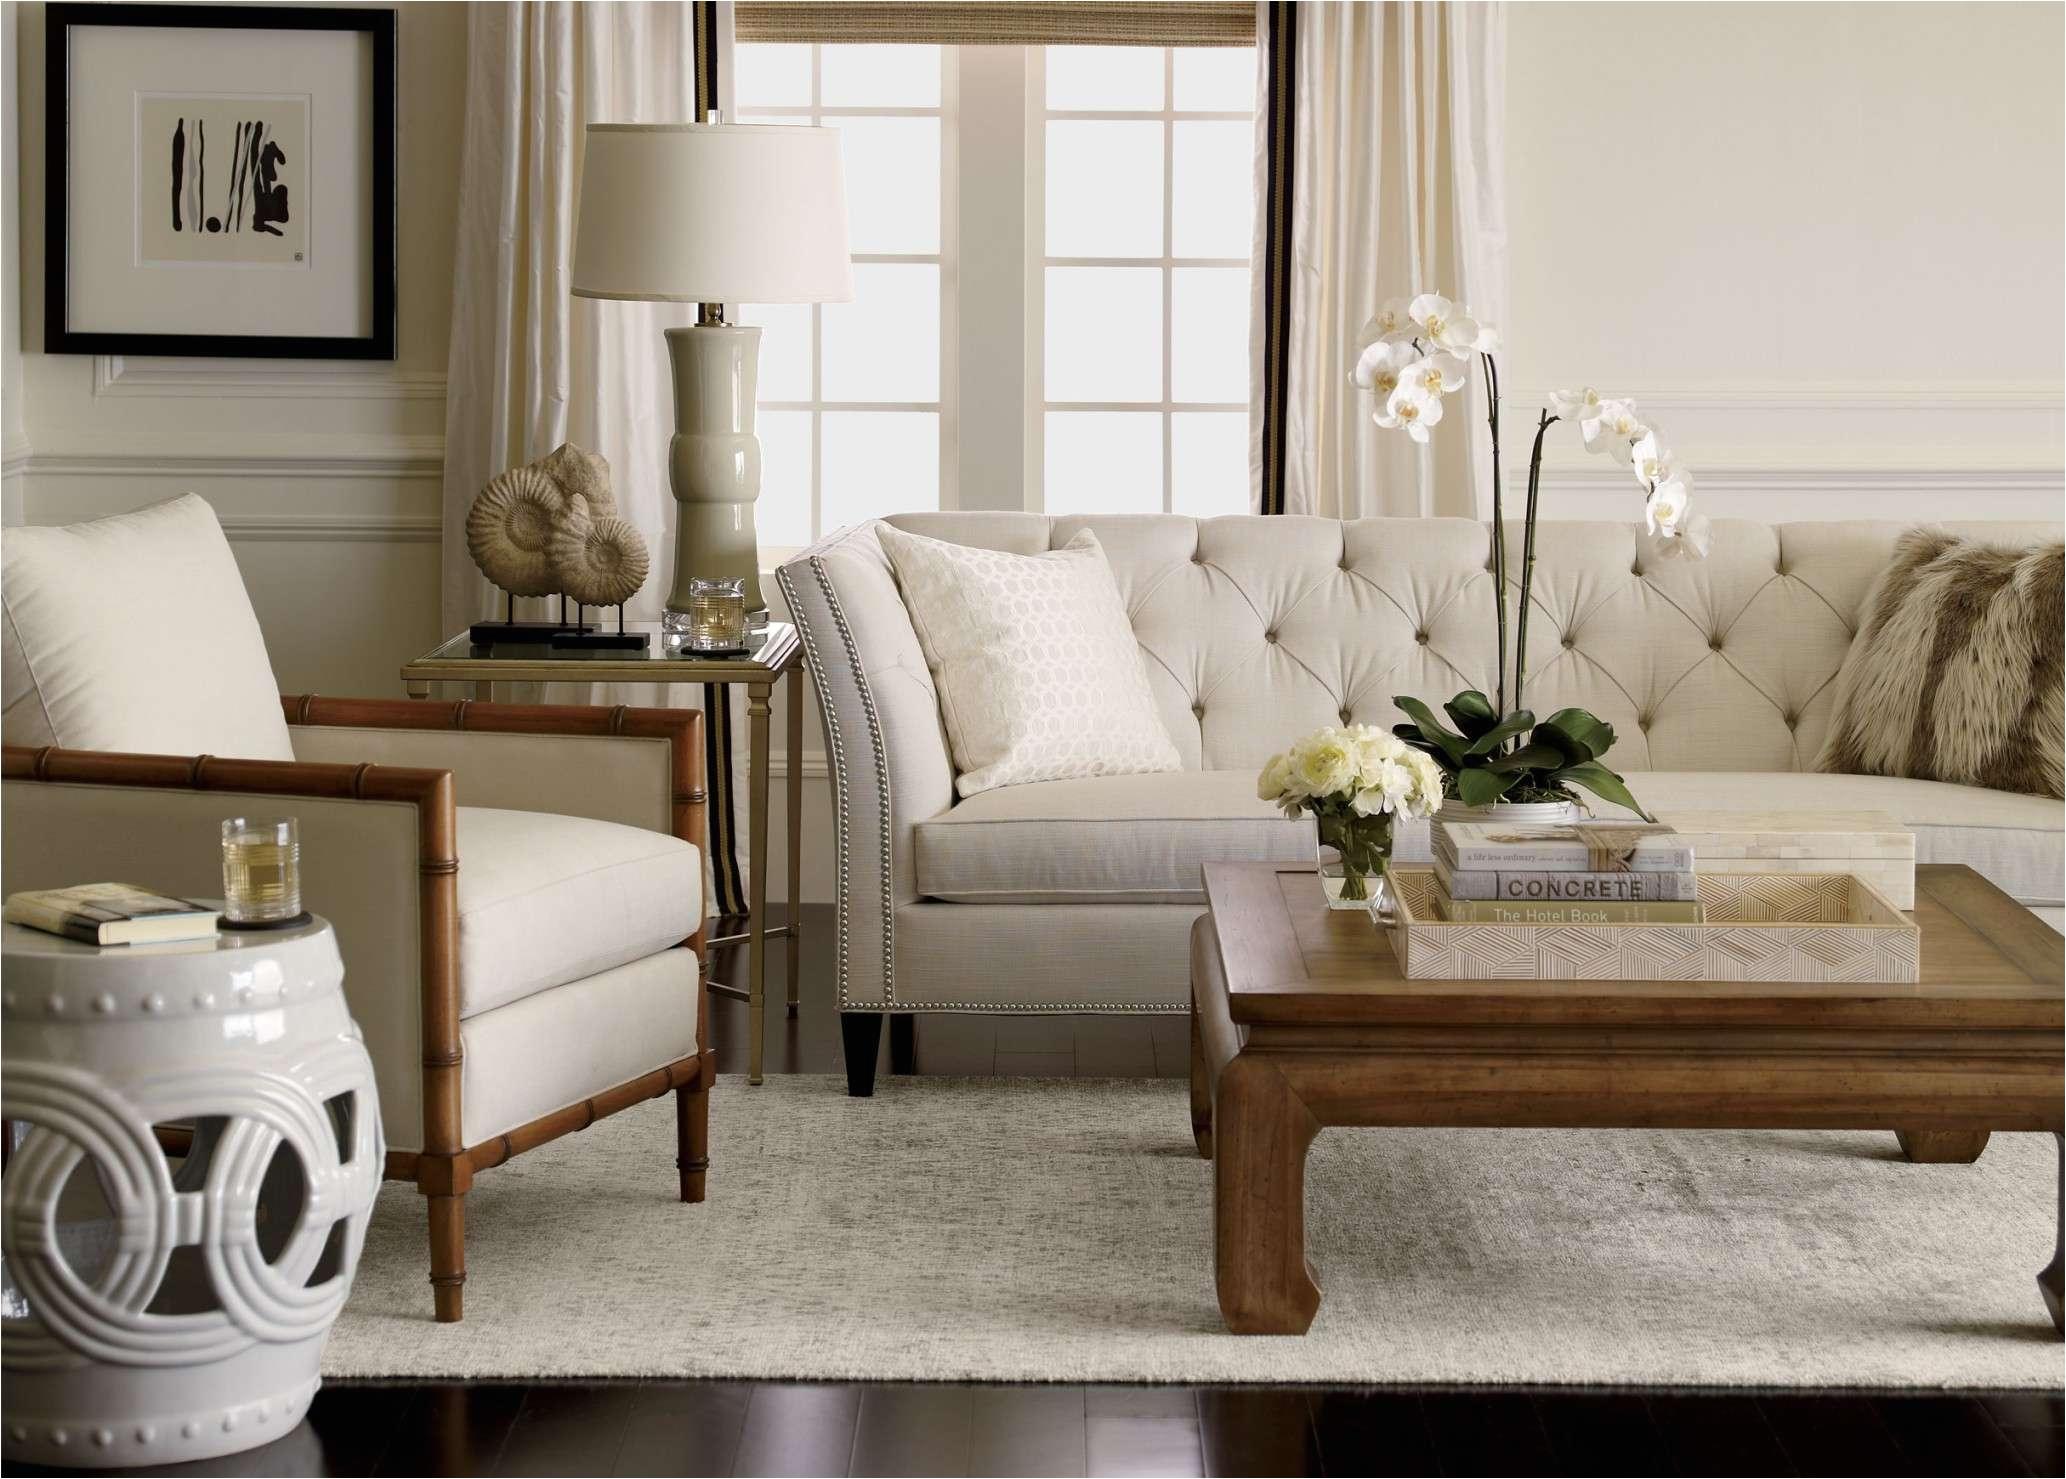 ethan allen elements bedroom collection luxury ethan allen bedroom furniture 1960 s - Ethan Allen Bedroom Furniture